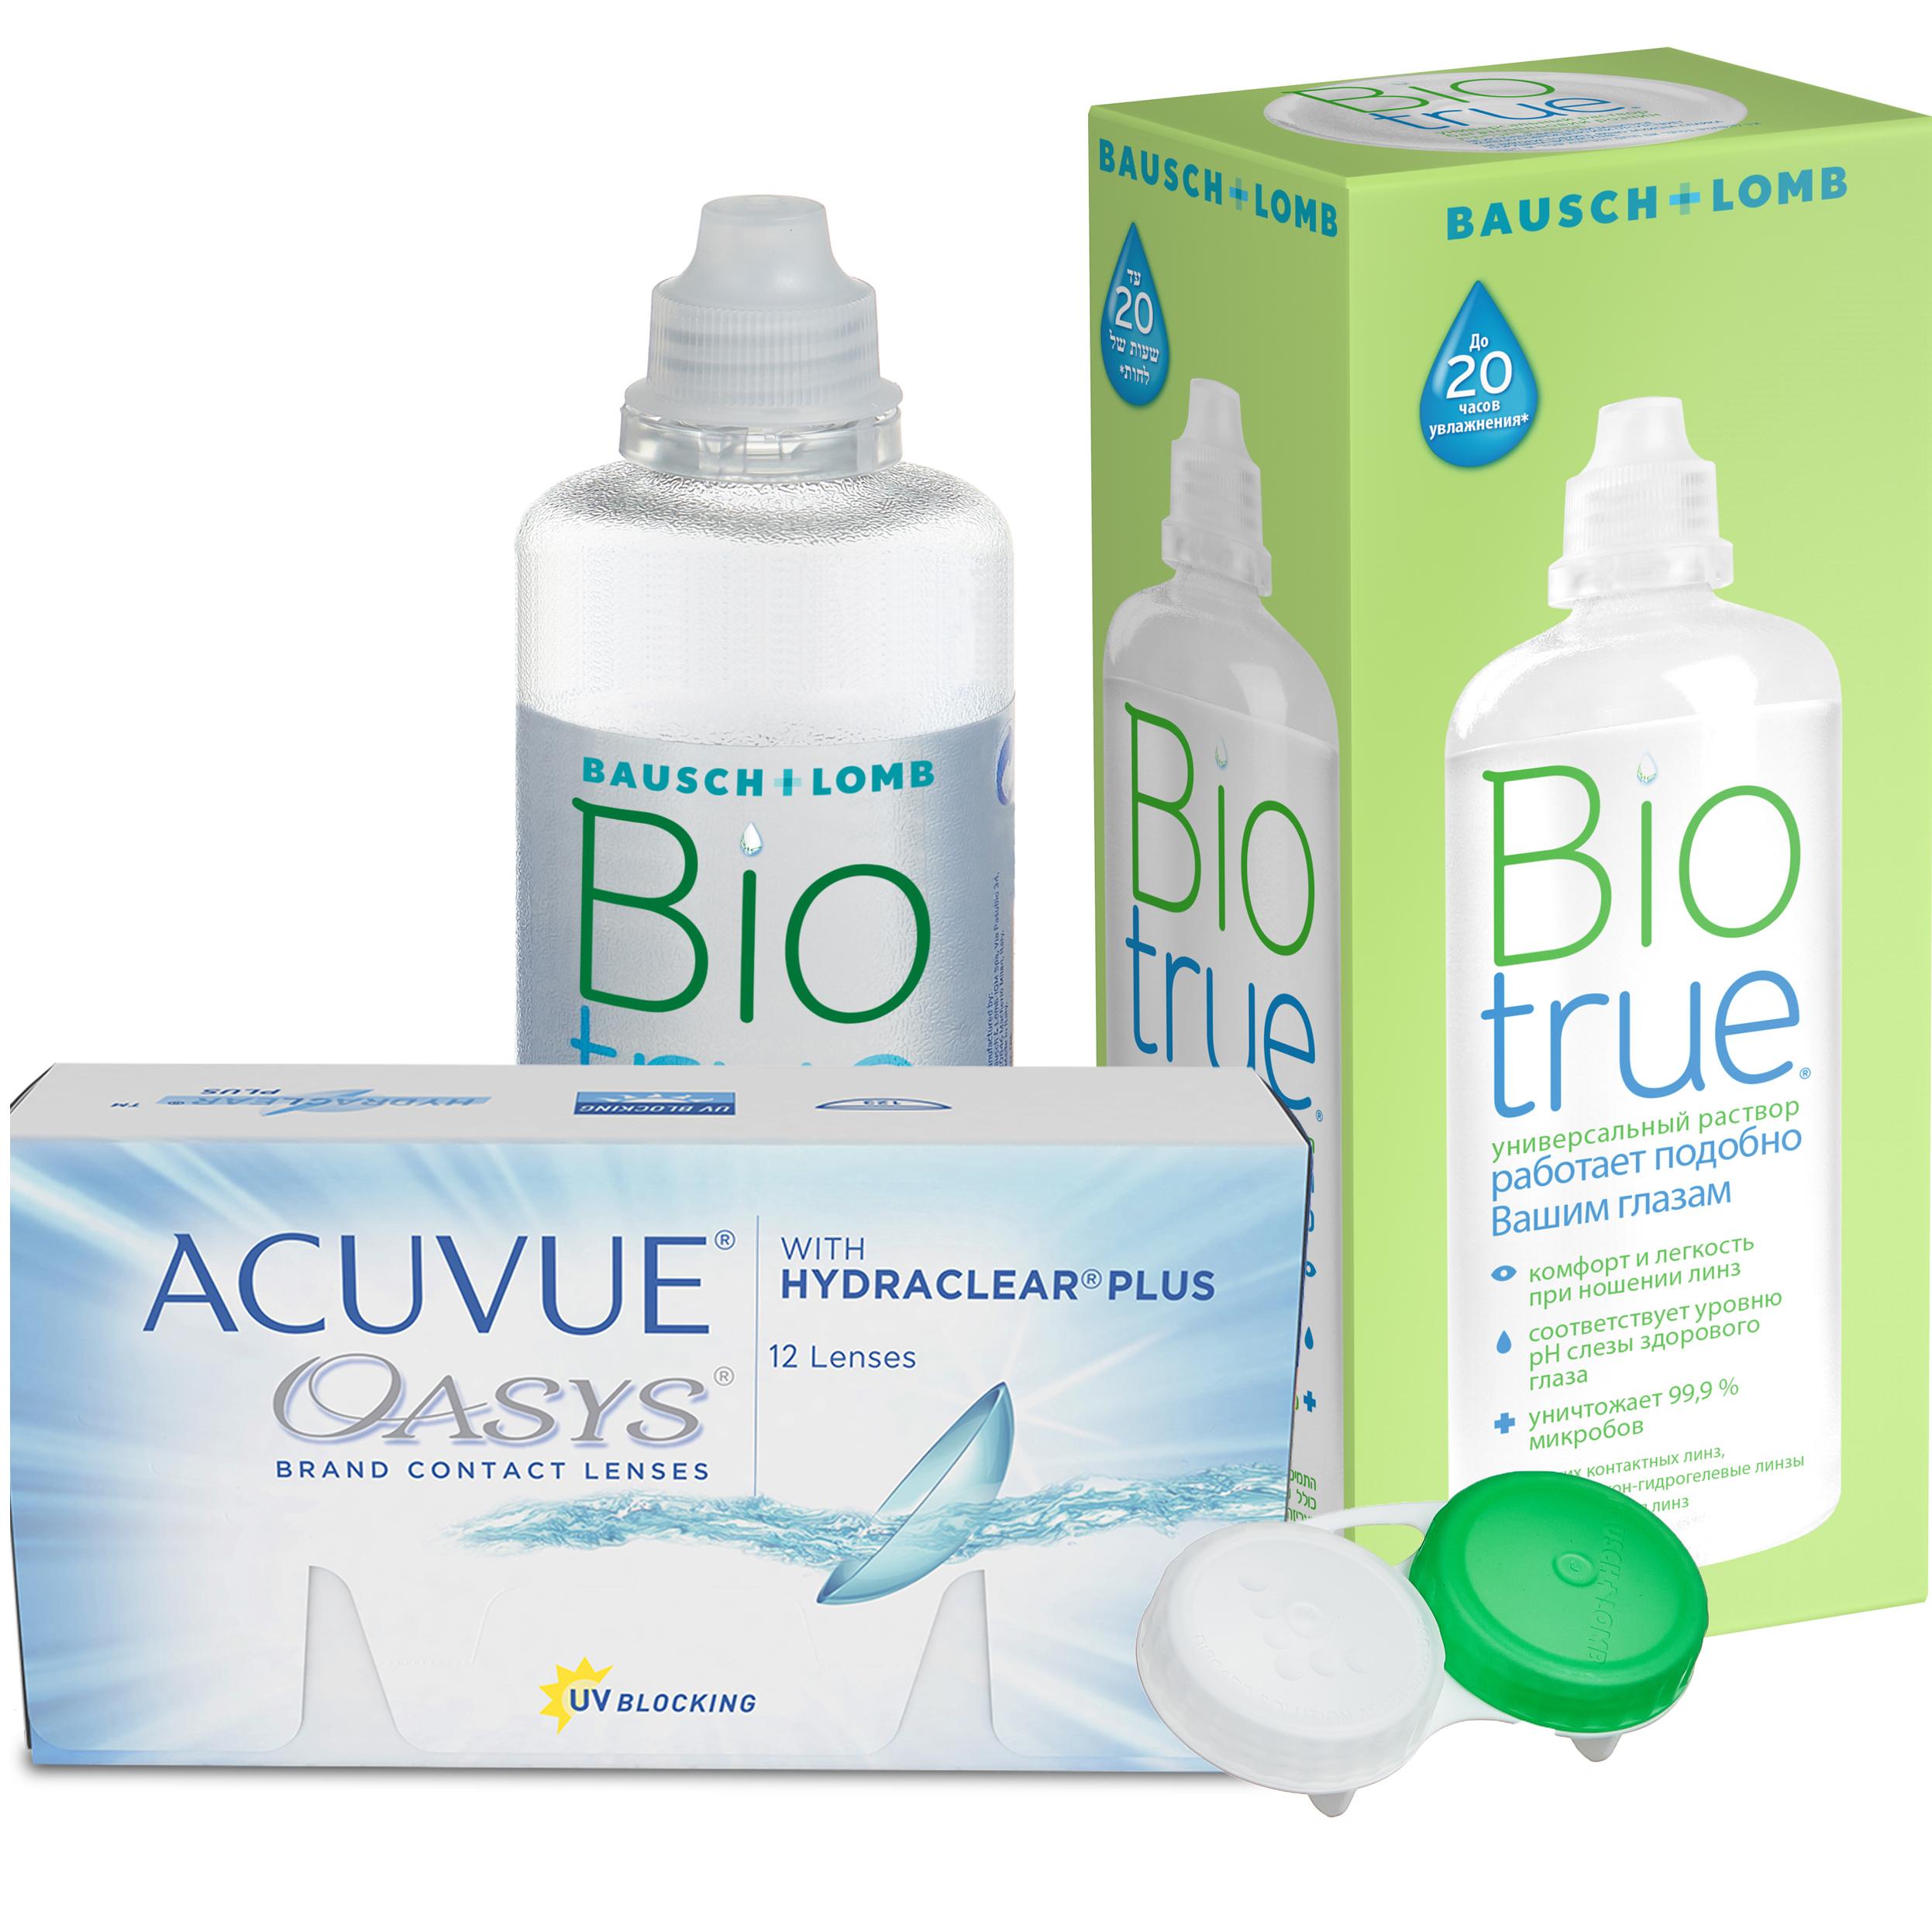 Купить Oasys with Hydraclear Plus 12 линз + Biotrue, Контактные линзы Acuvue Oasys with Hydraclear Plus 12 линз R 8.4 +0, 50 + Biotrue 300 мл